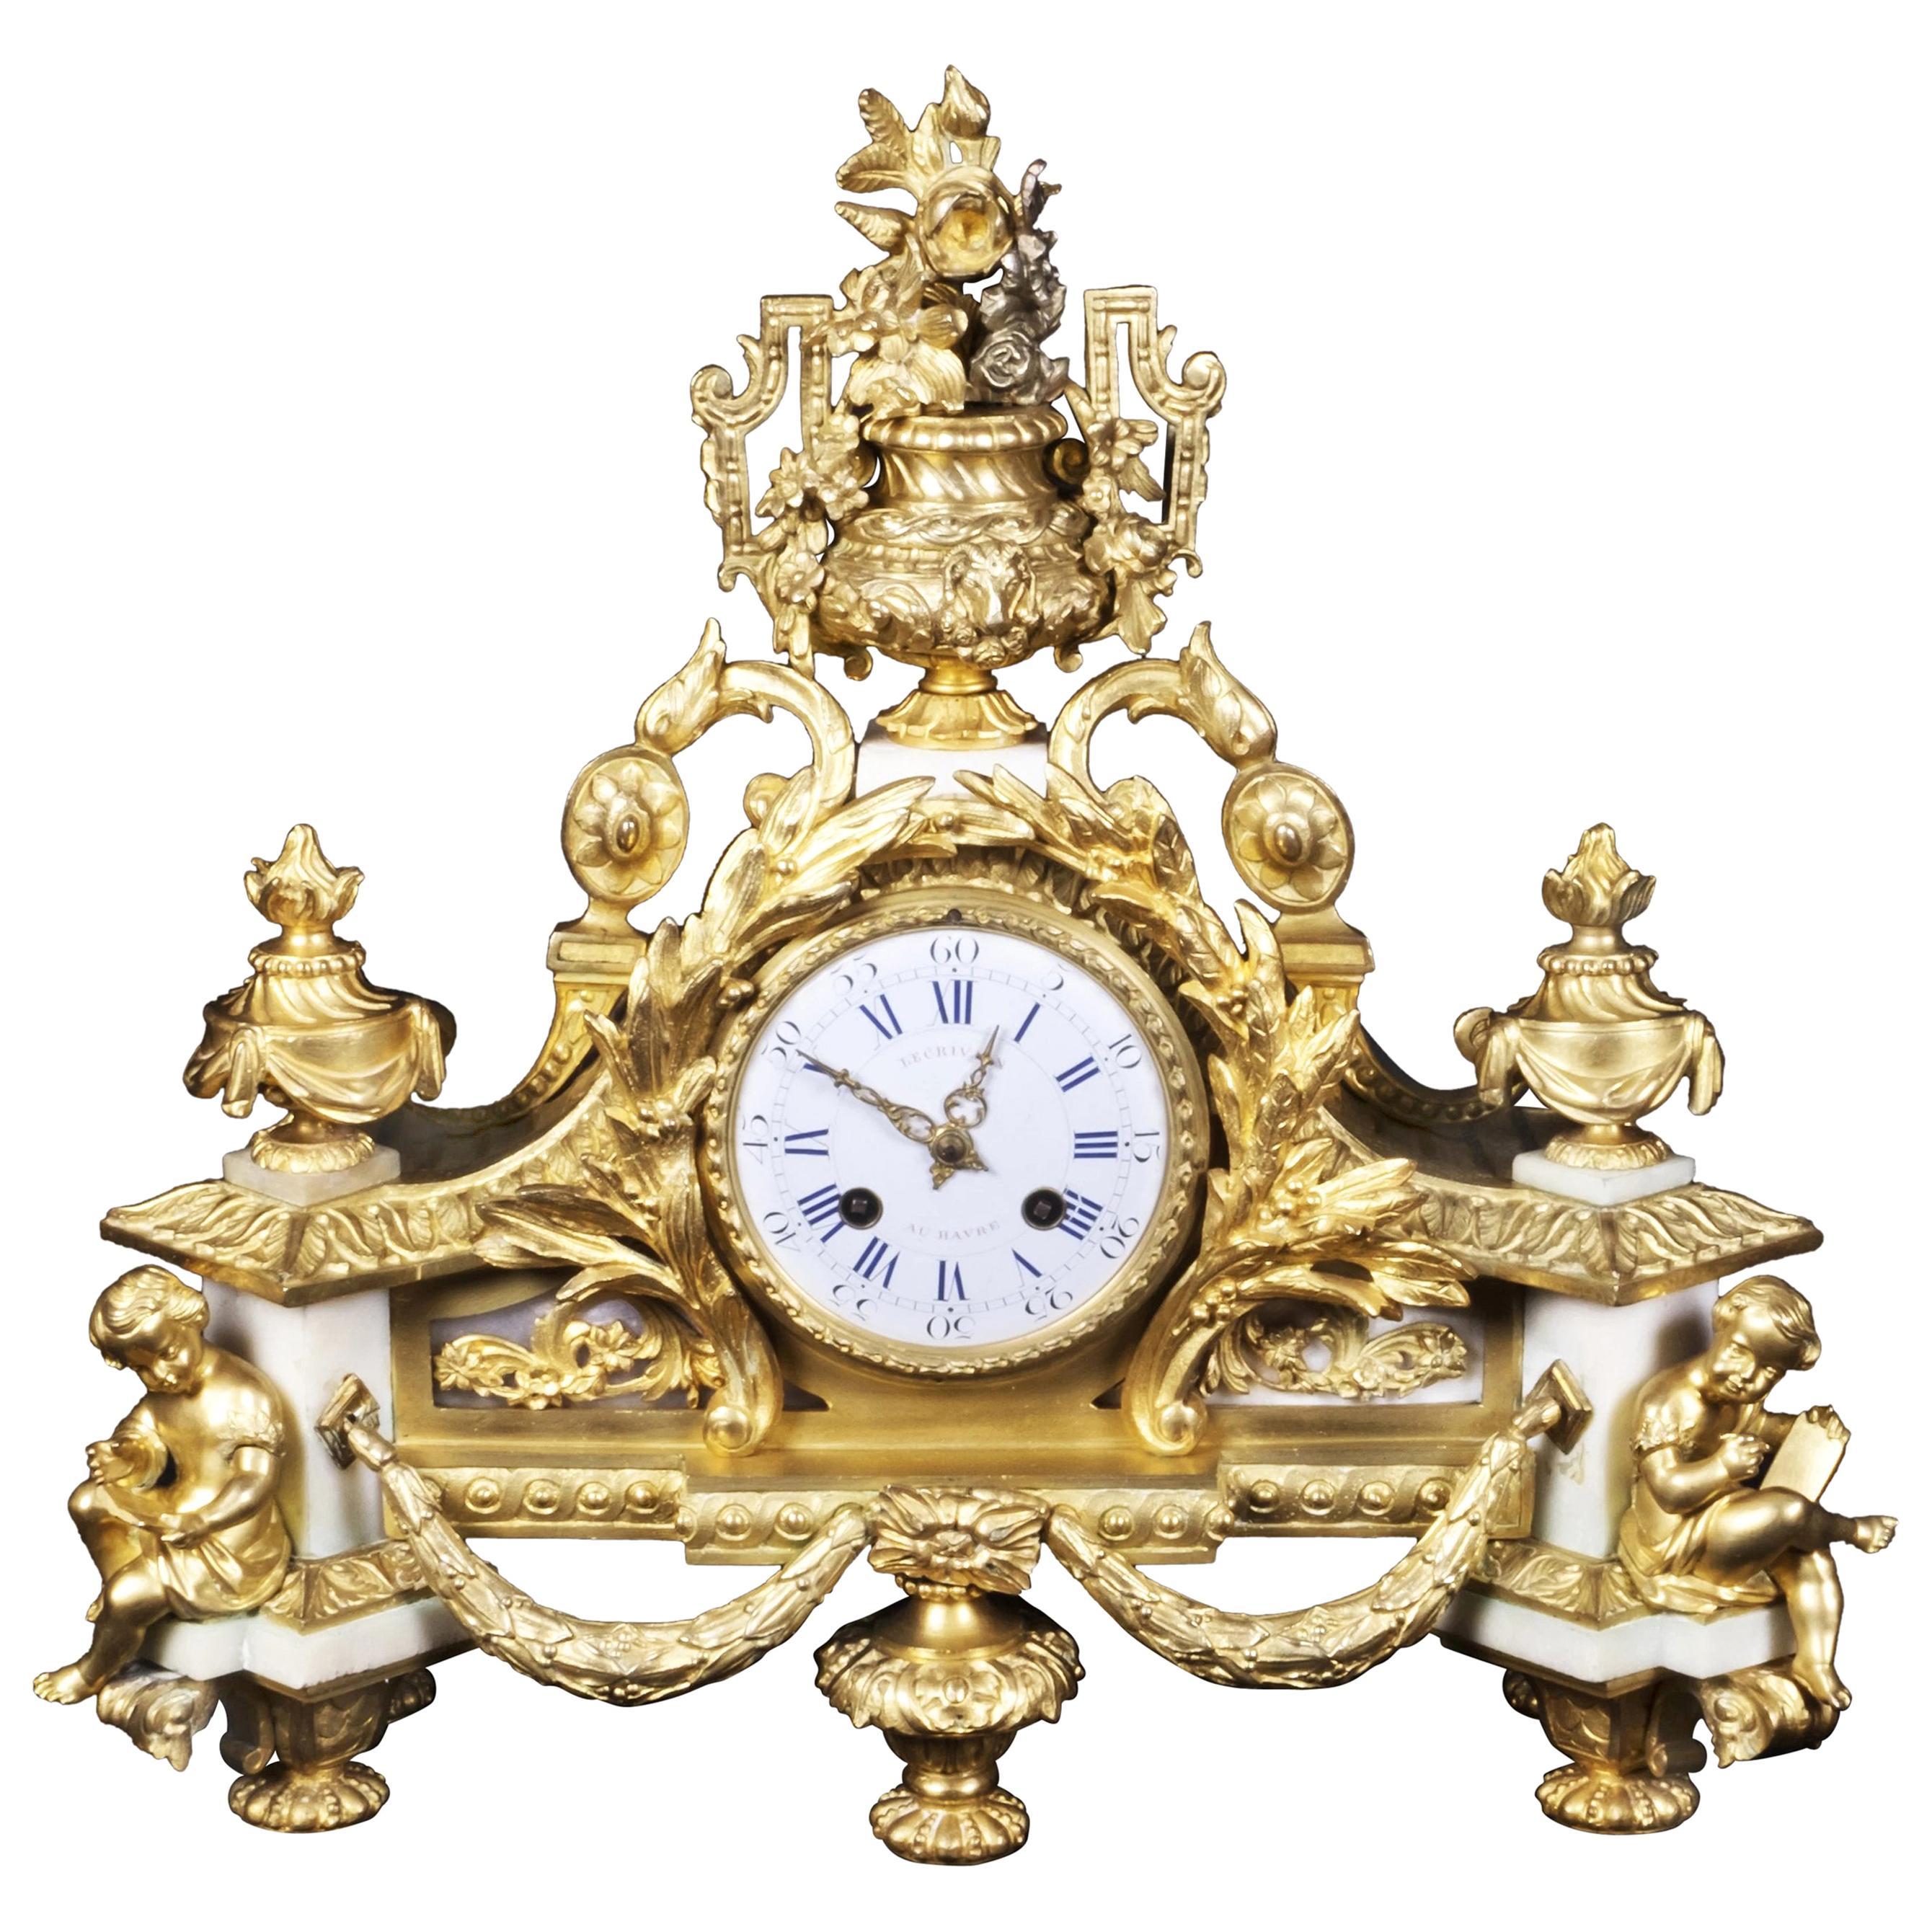 French Ormolu Mantel Clock France, Mid-Late 19th Century